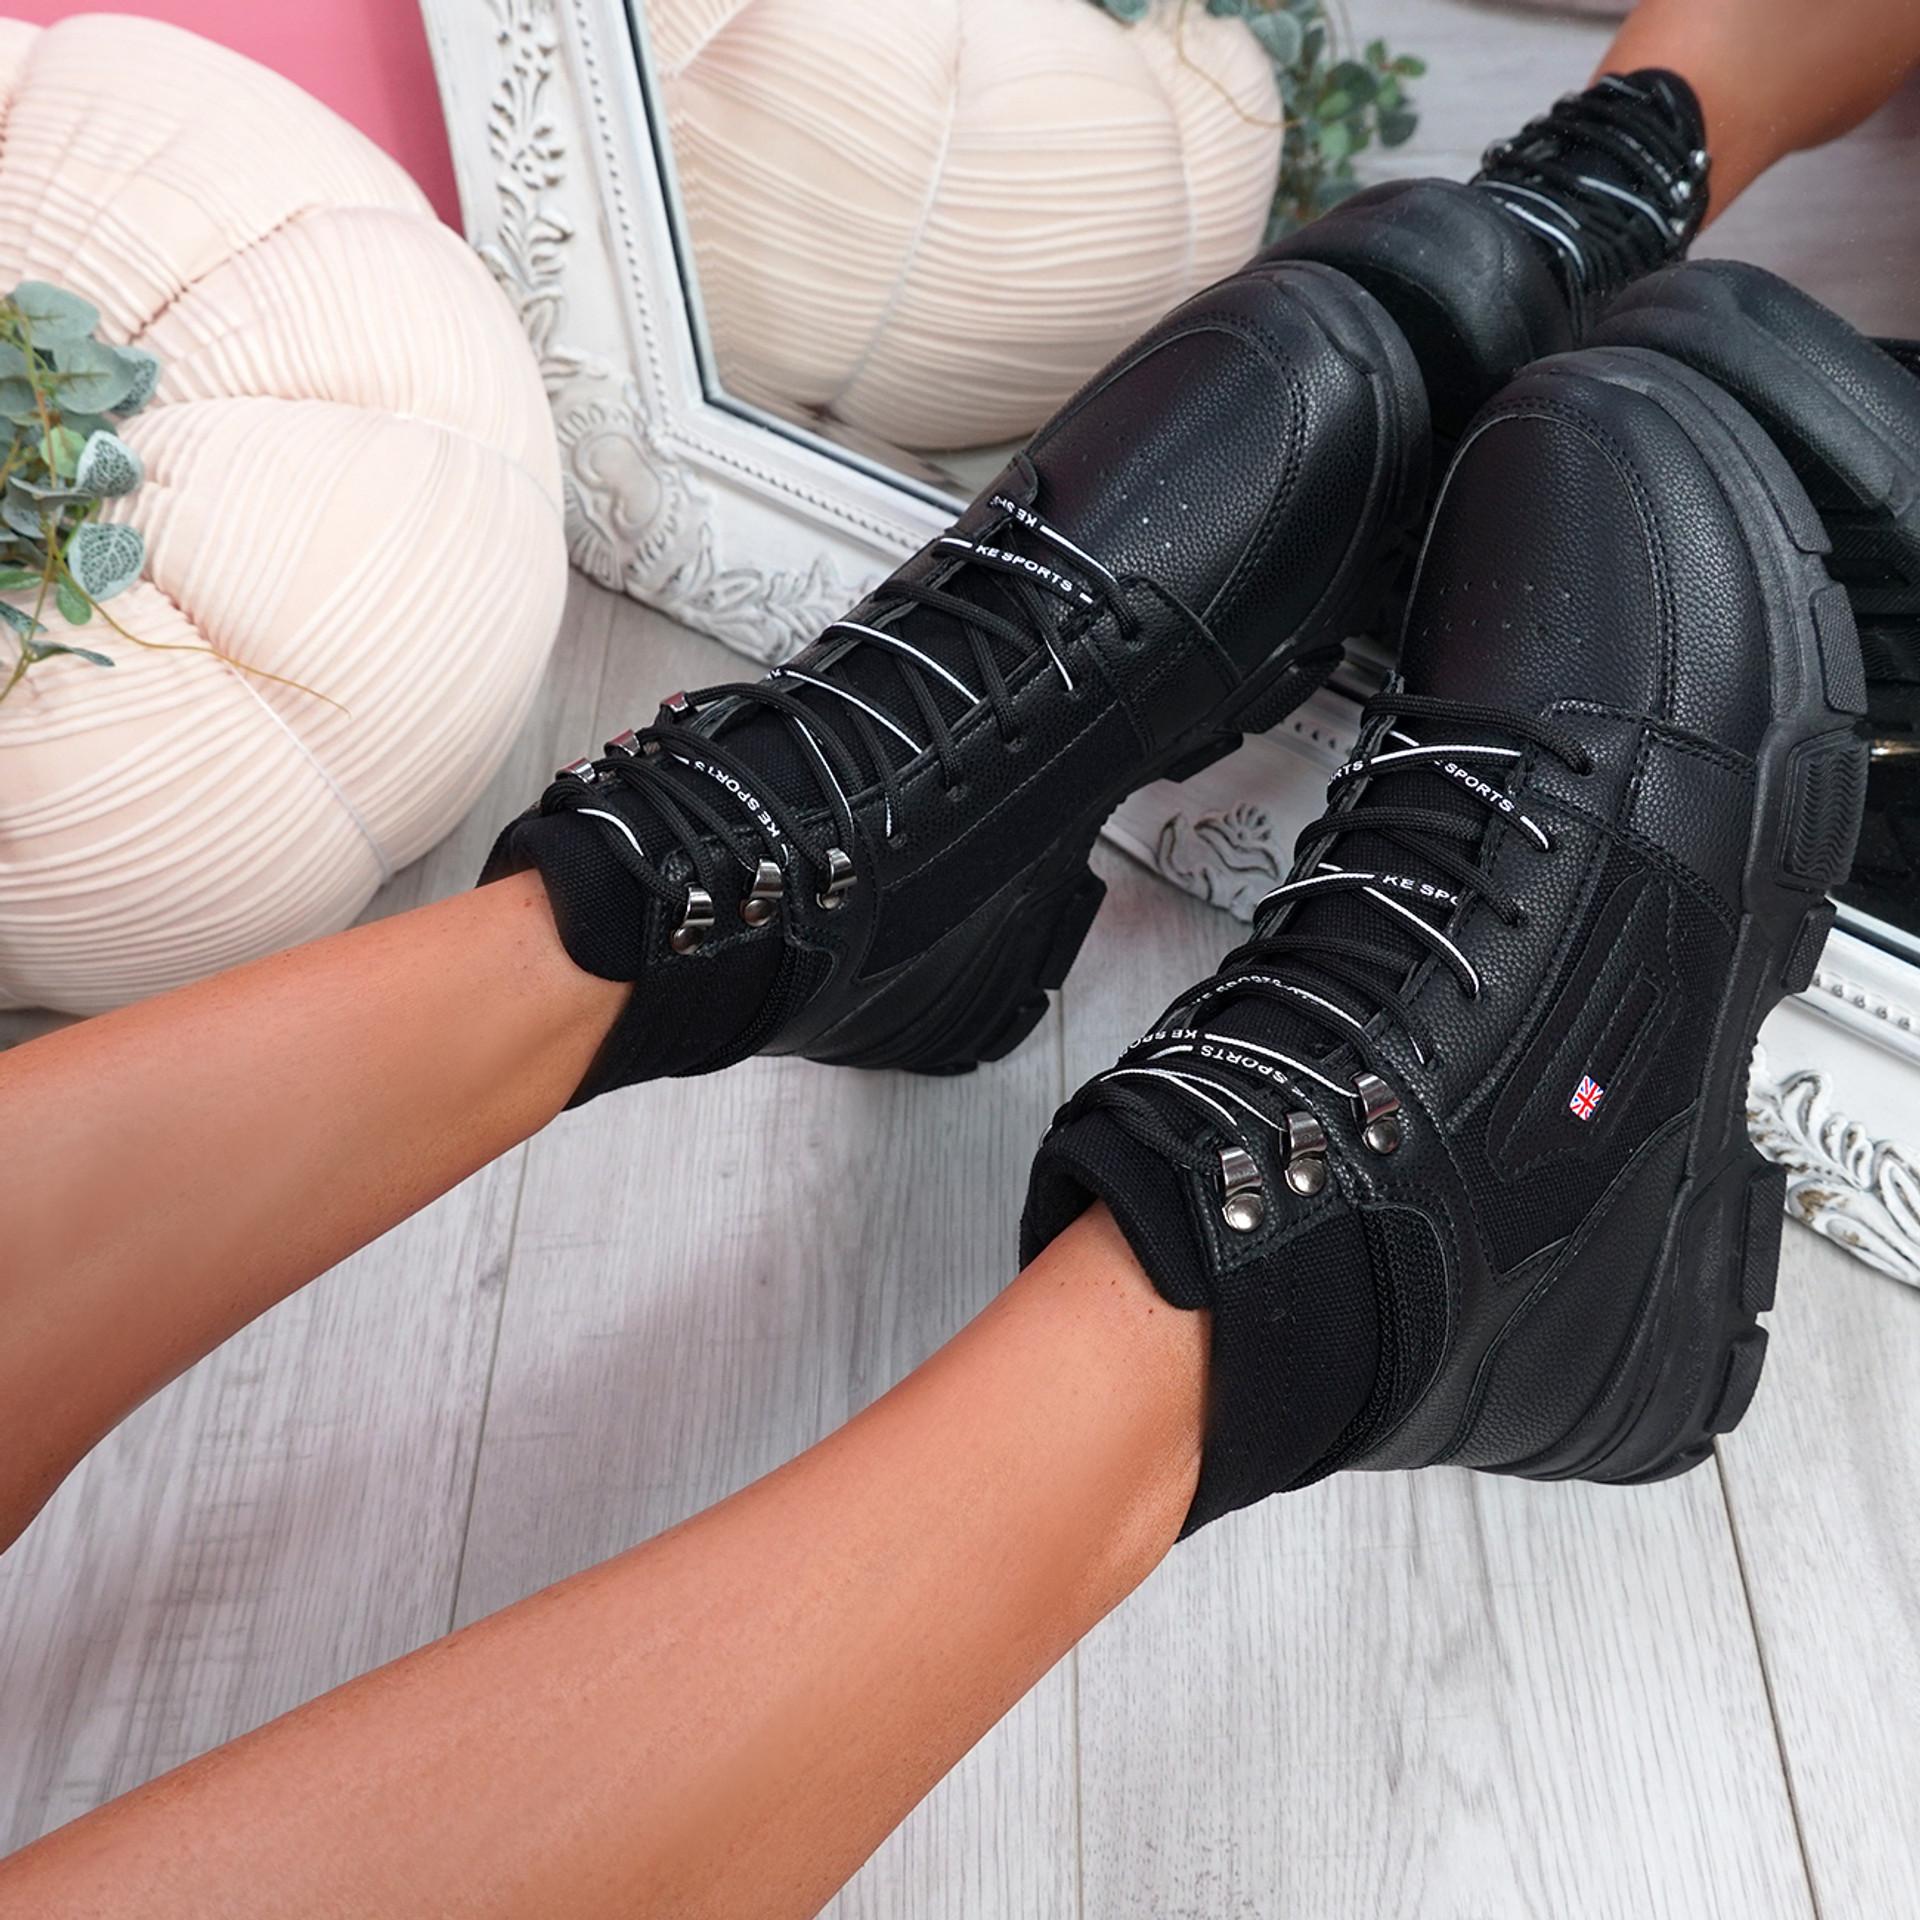 Luva Black Ankle Boots